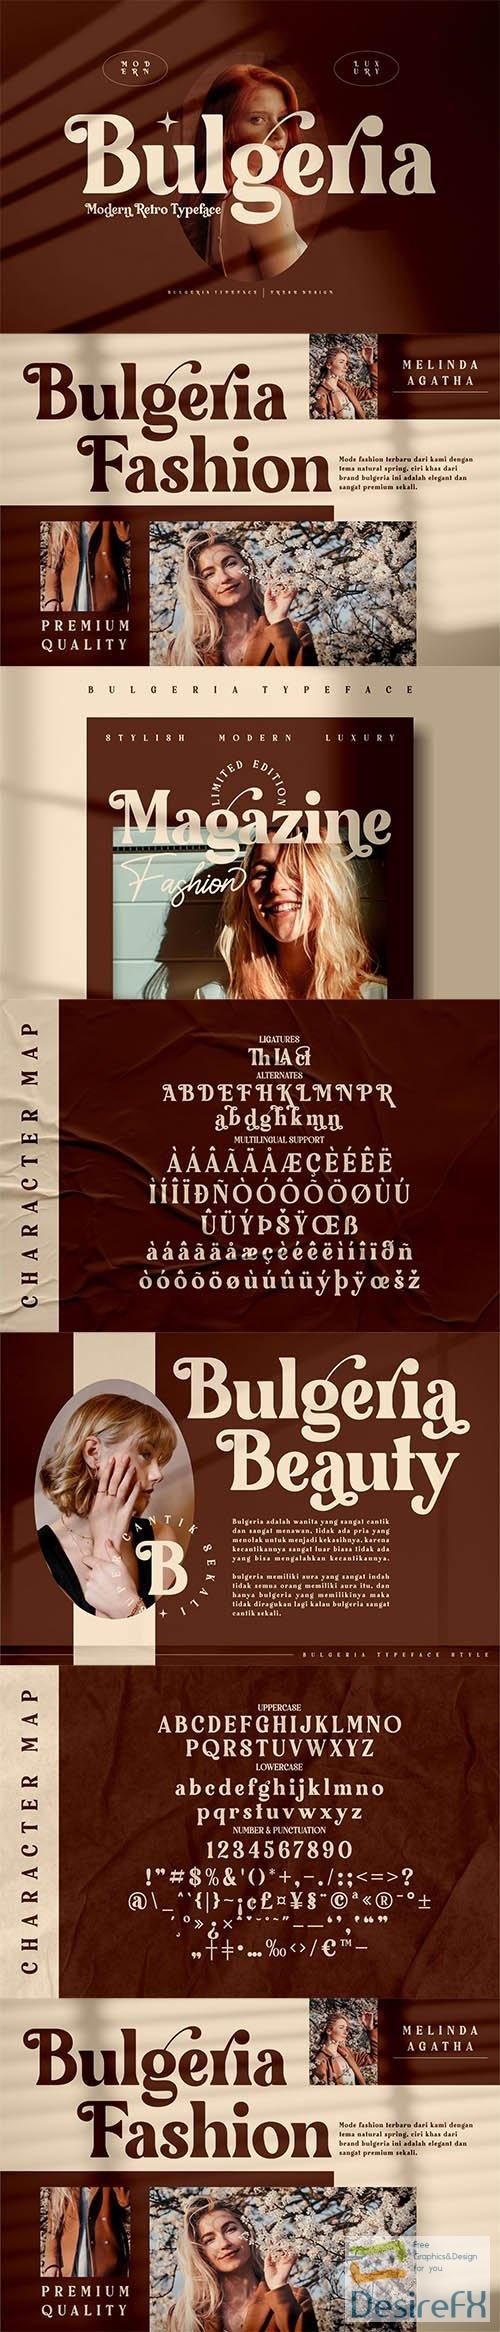 Bulgeria Classy Serif Font 6274173